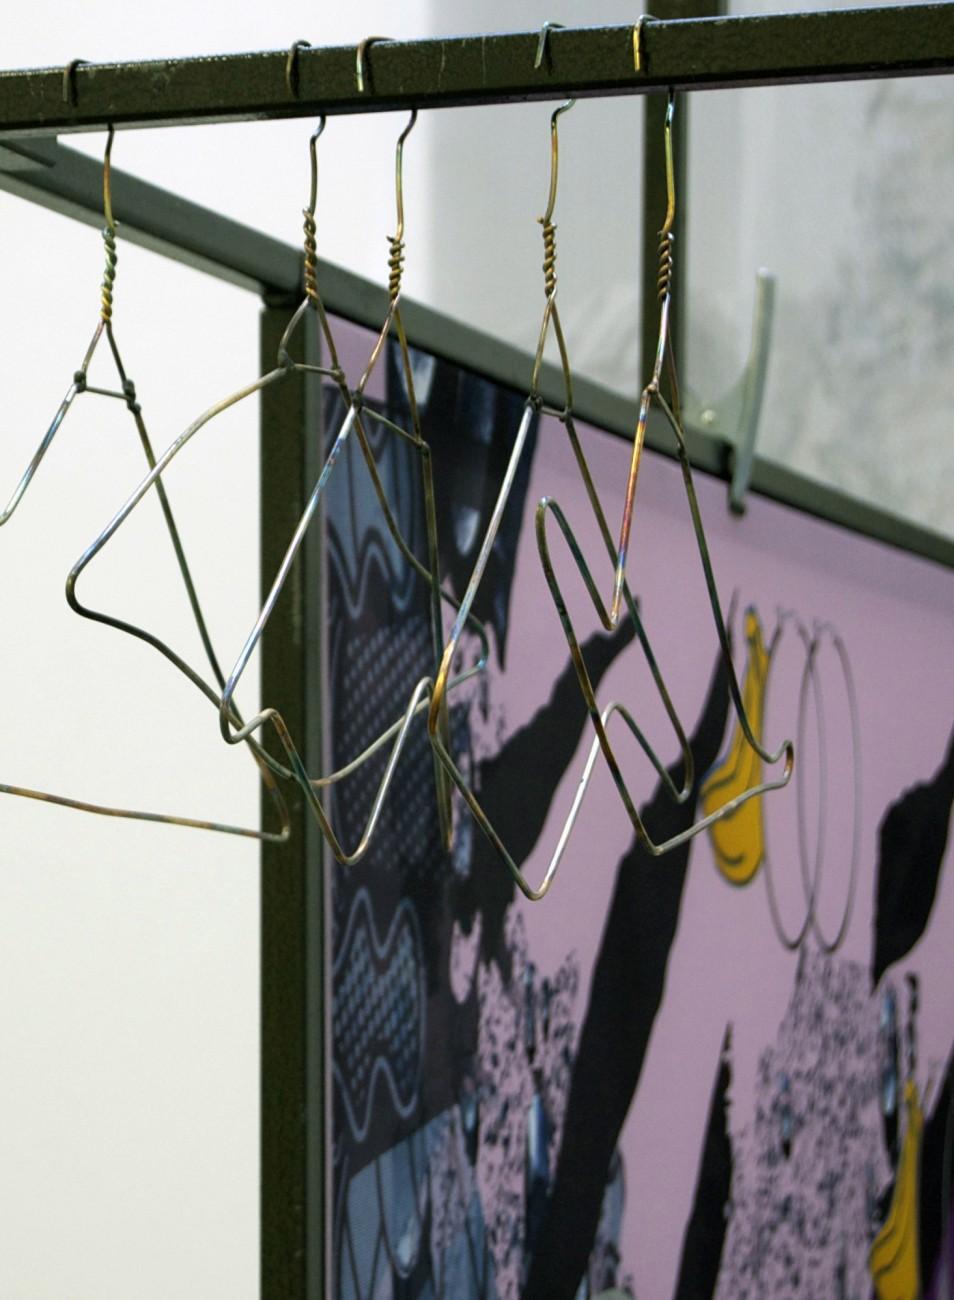 Detail, torched bronze hangers